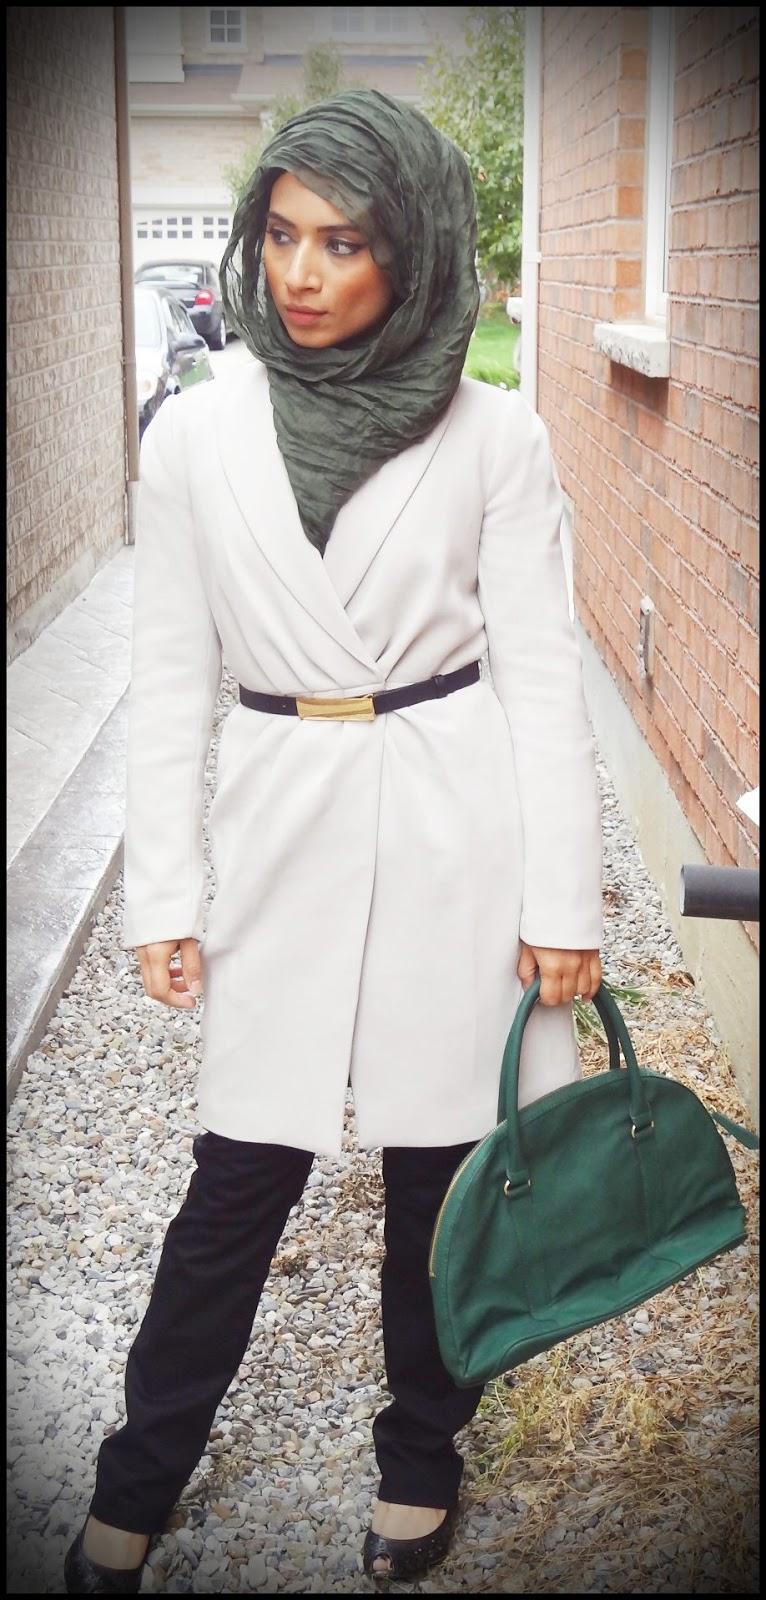 Saman 39 S Makeup And Hijab Styles Casual Yet Elegant